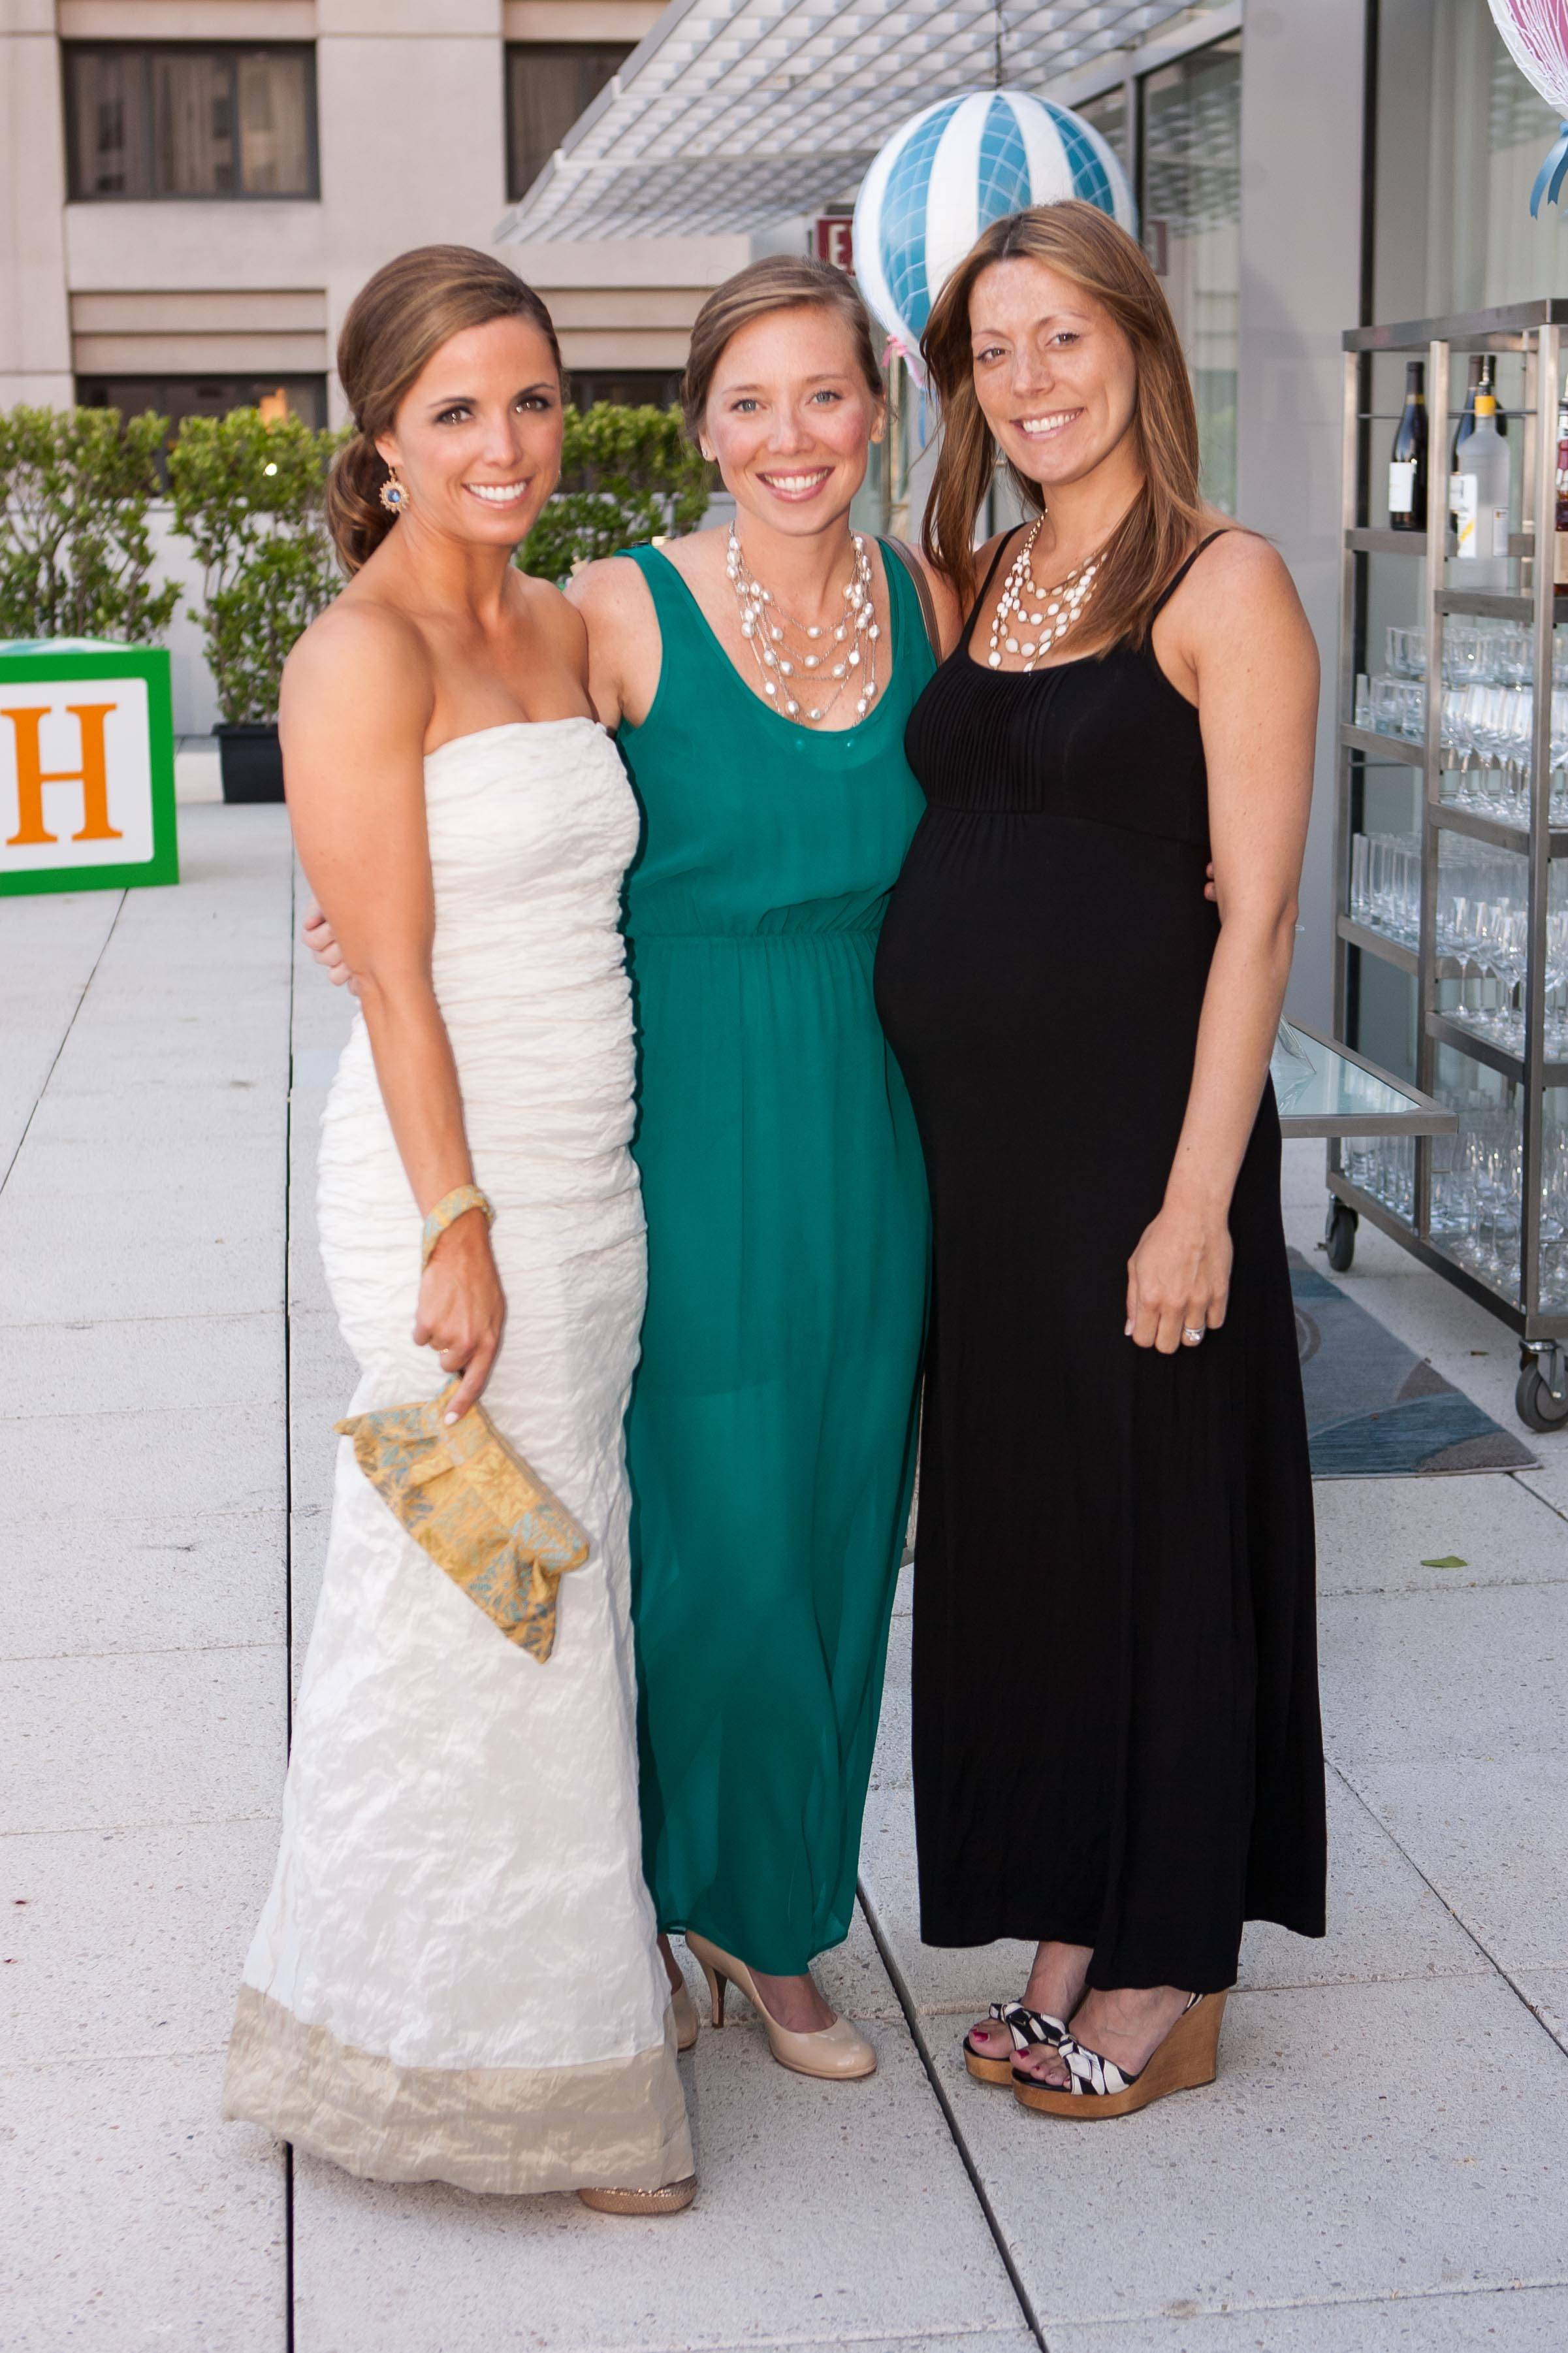 Lauren Eastman, Amanda Patterson, Jenna Mesic